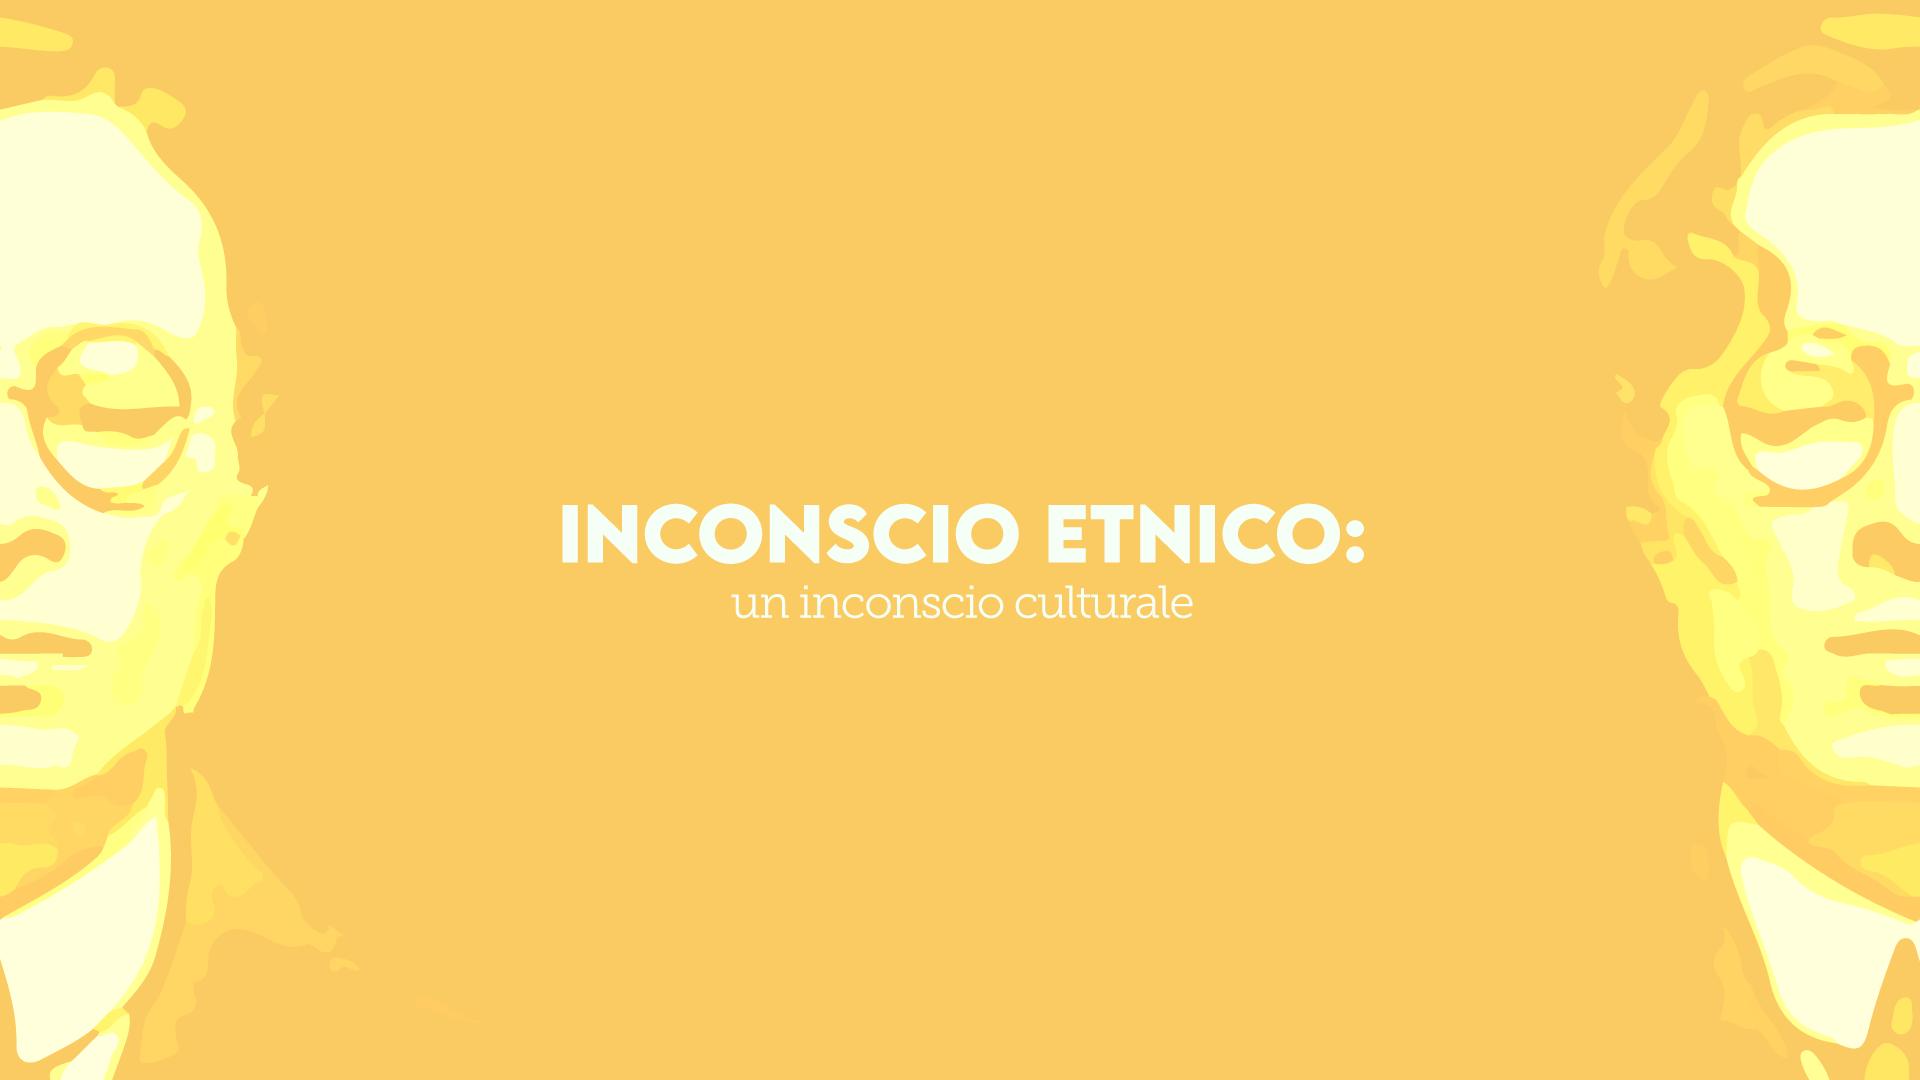 inconscio etnico